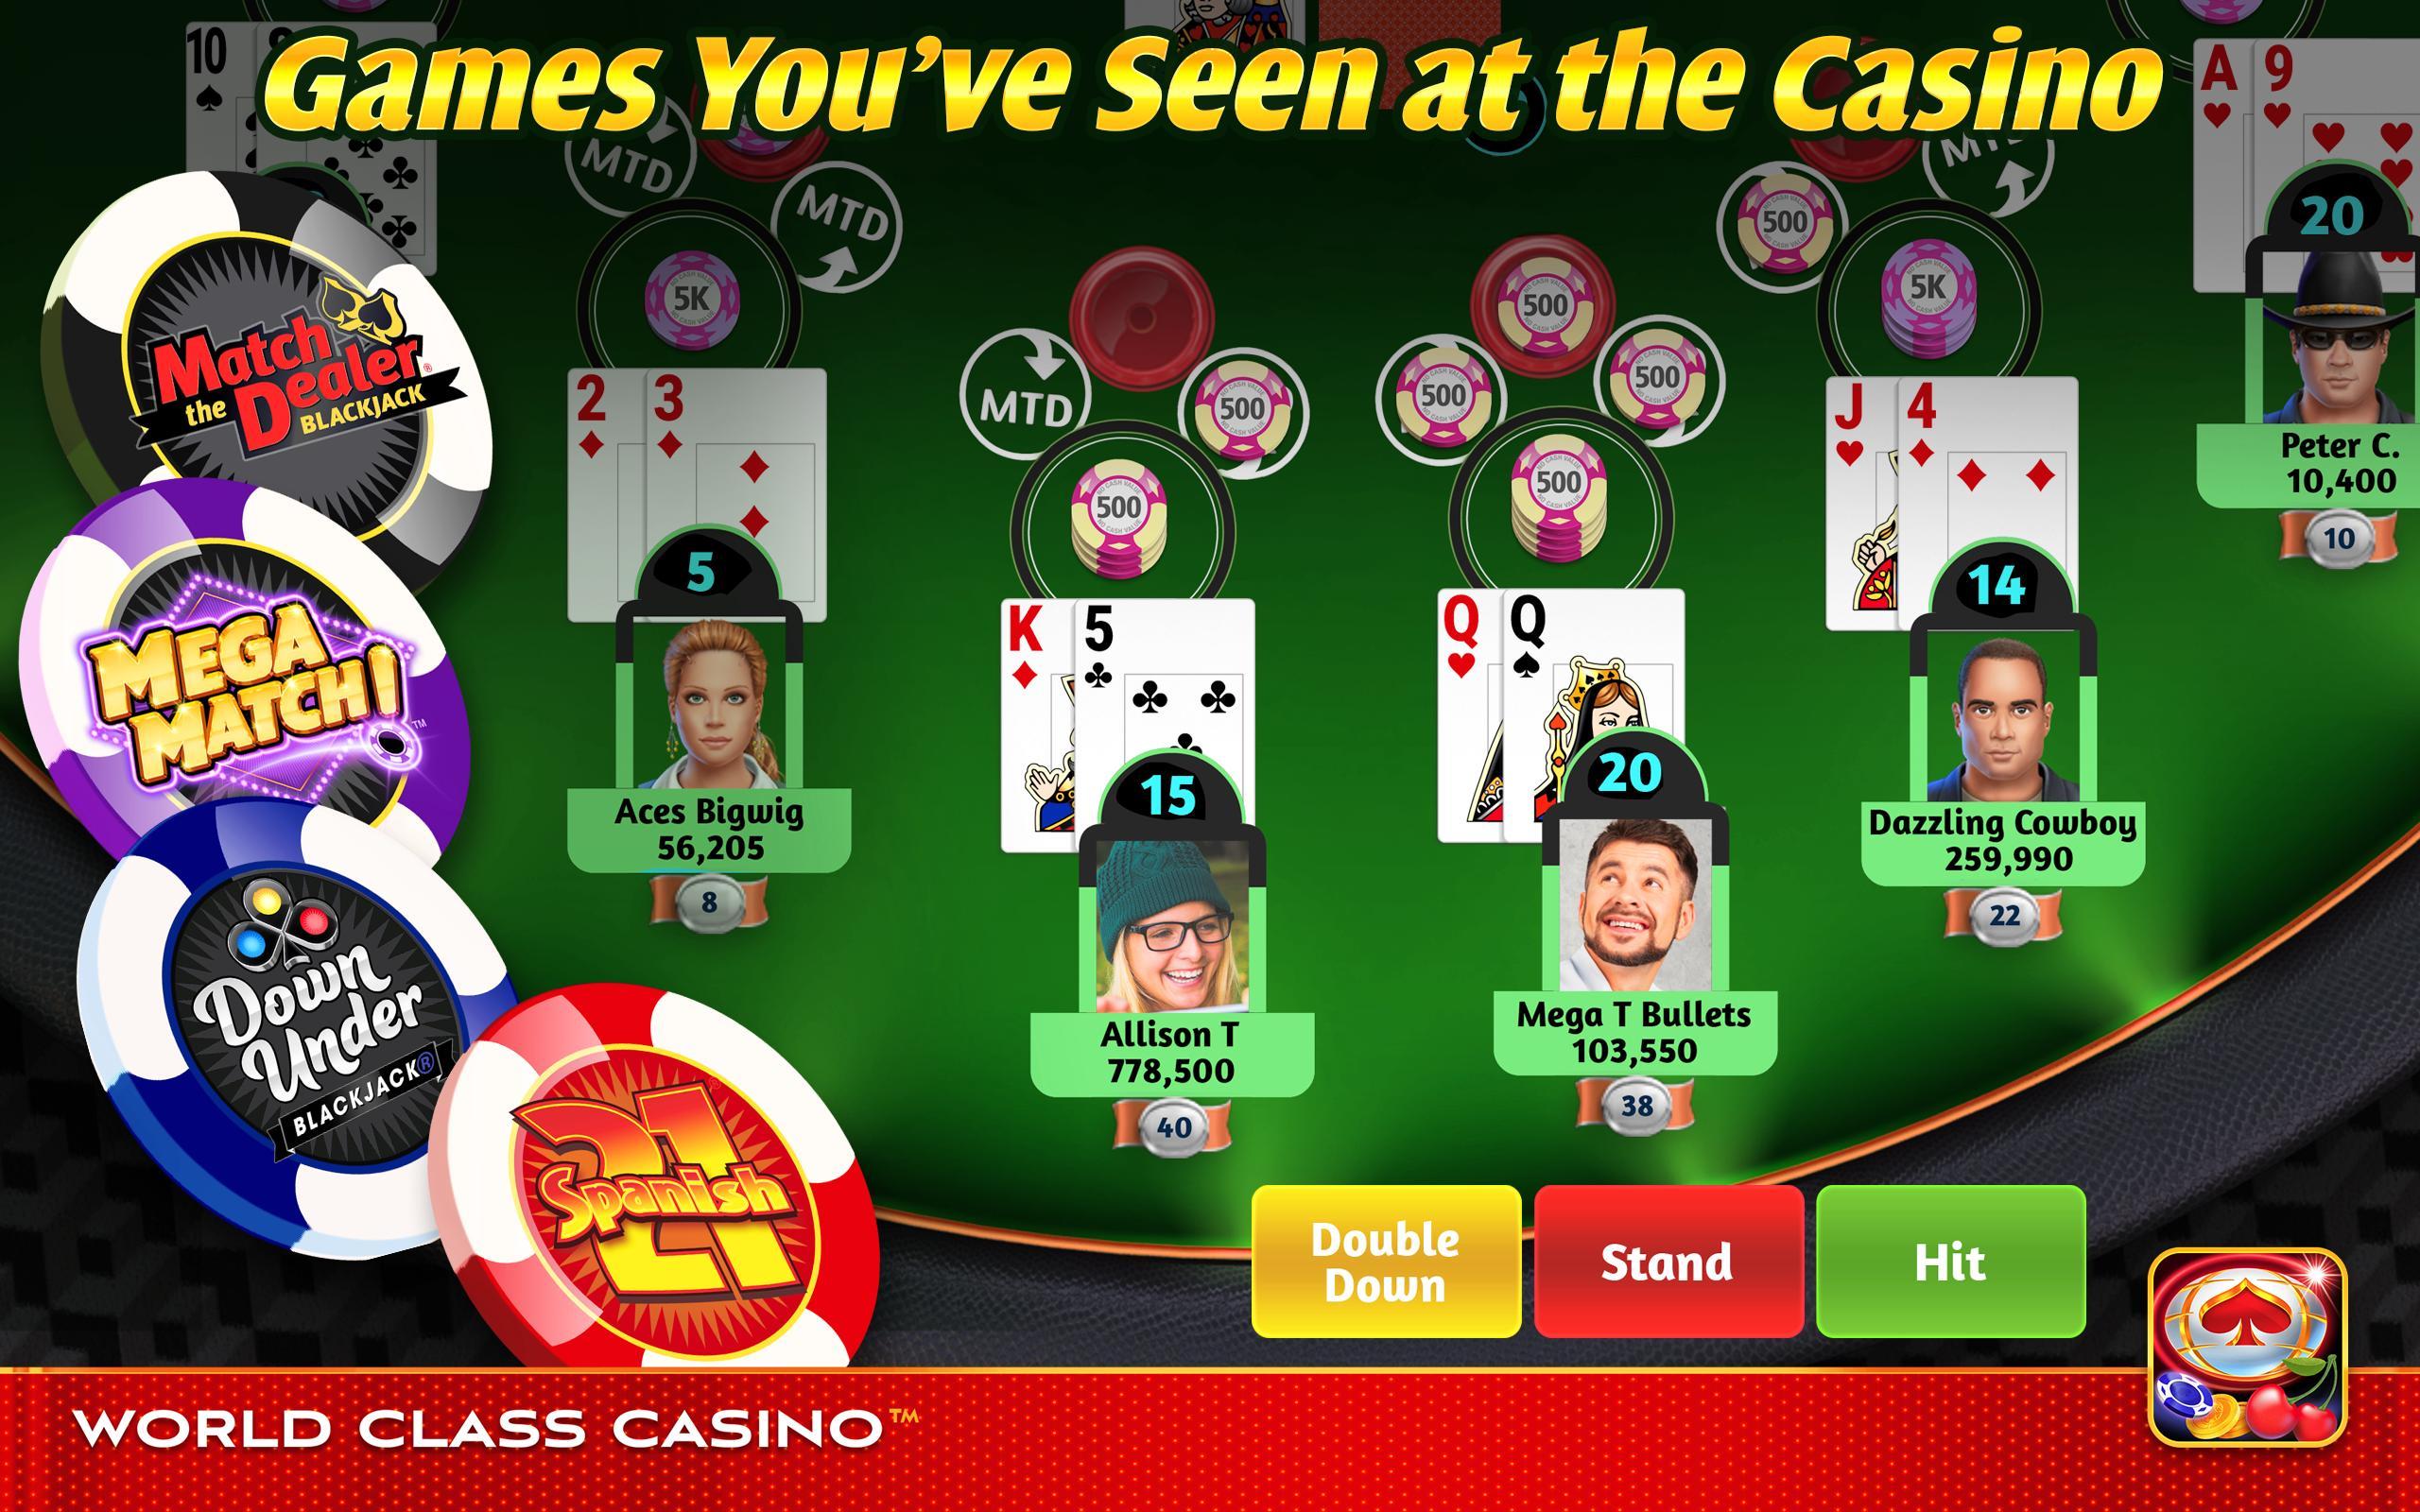 World Class Casino Slots, Blackjack & Poker Room 8.0.4 Screenshot 20